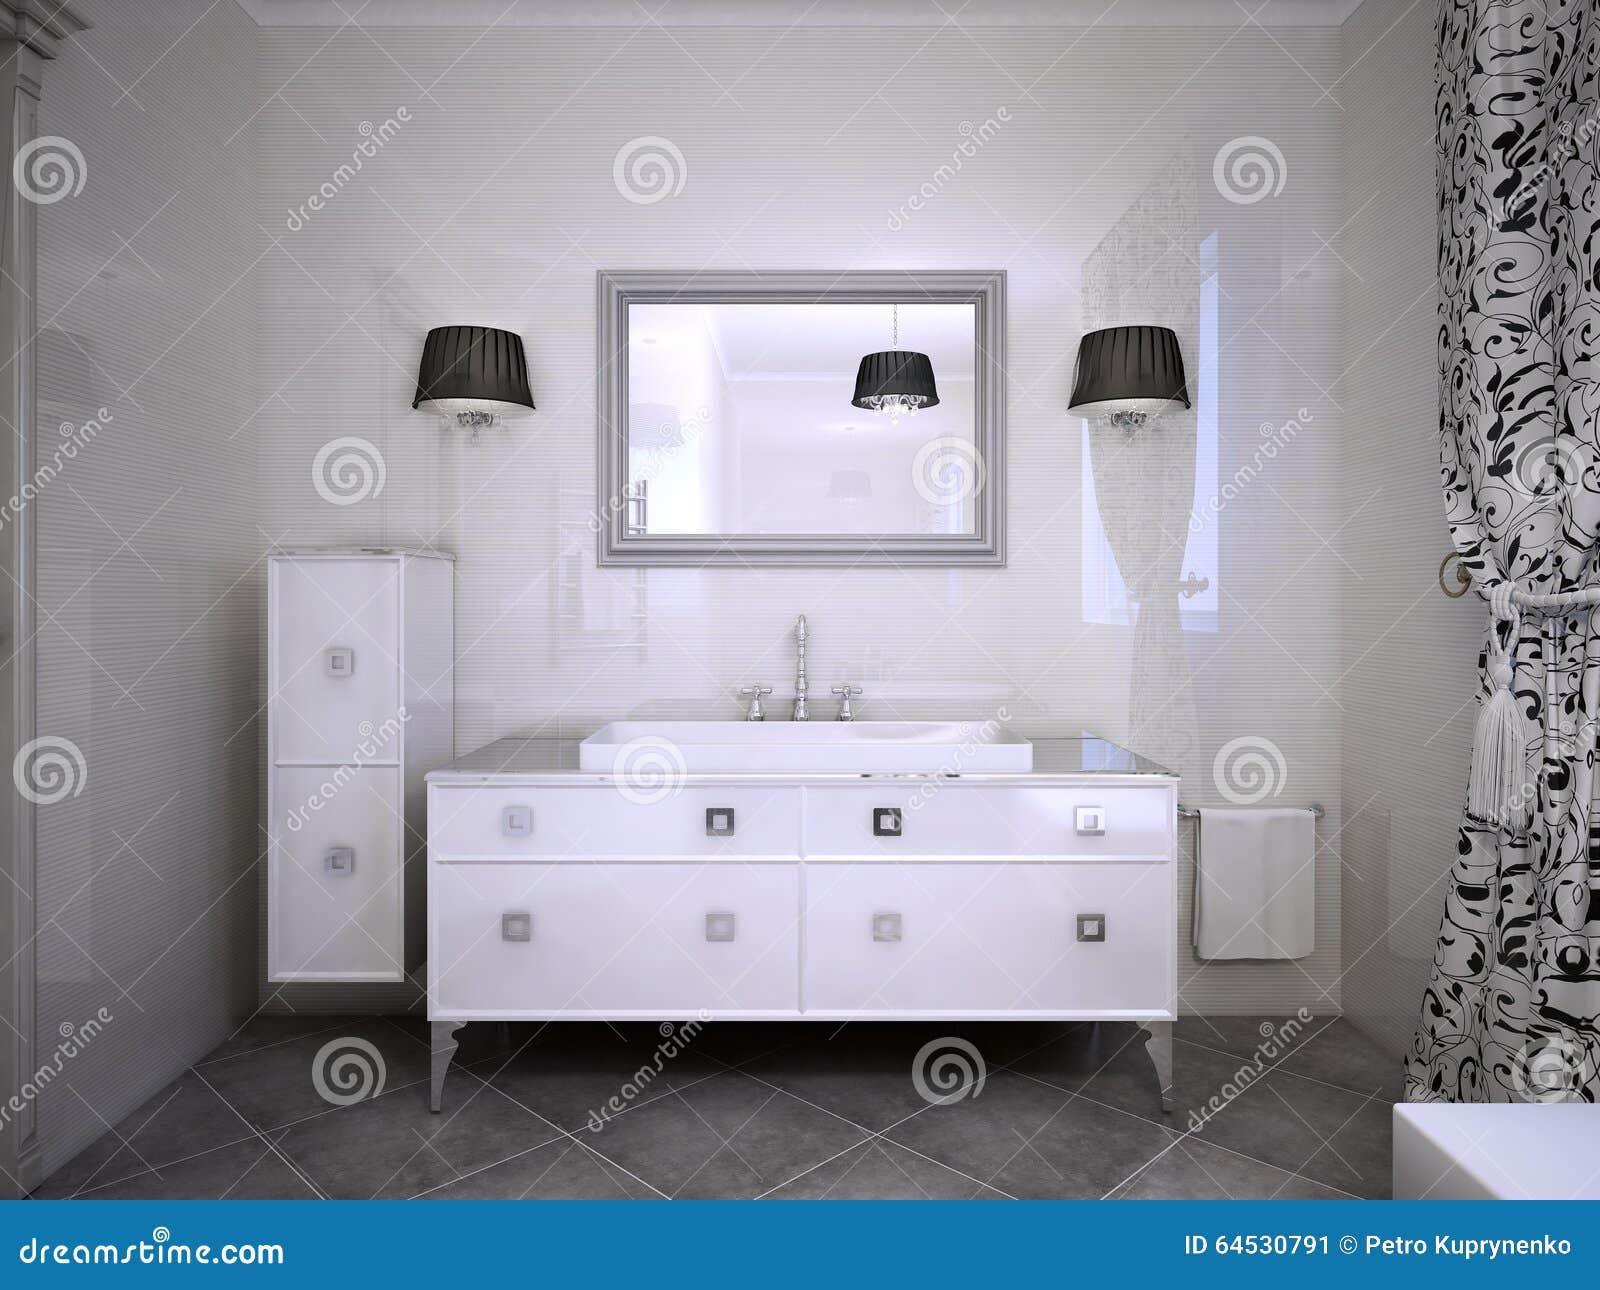 Glansigt vitt möblemang i badrum arkivfoto   bild: 64530791